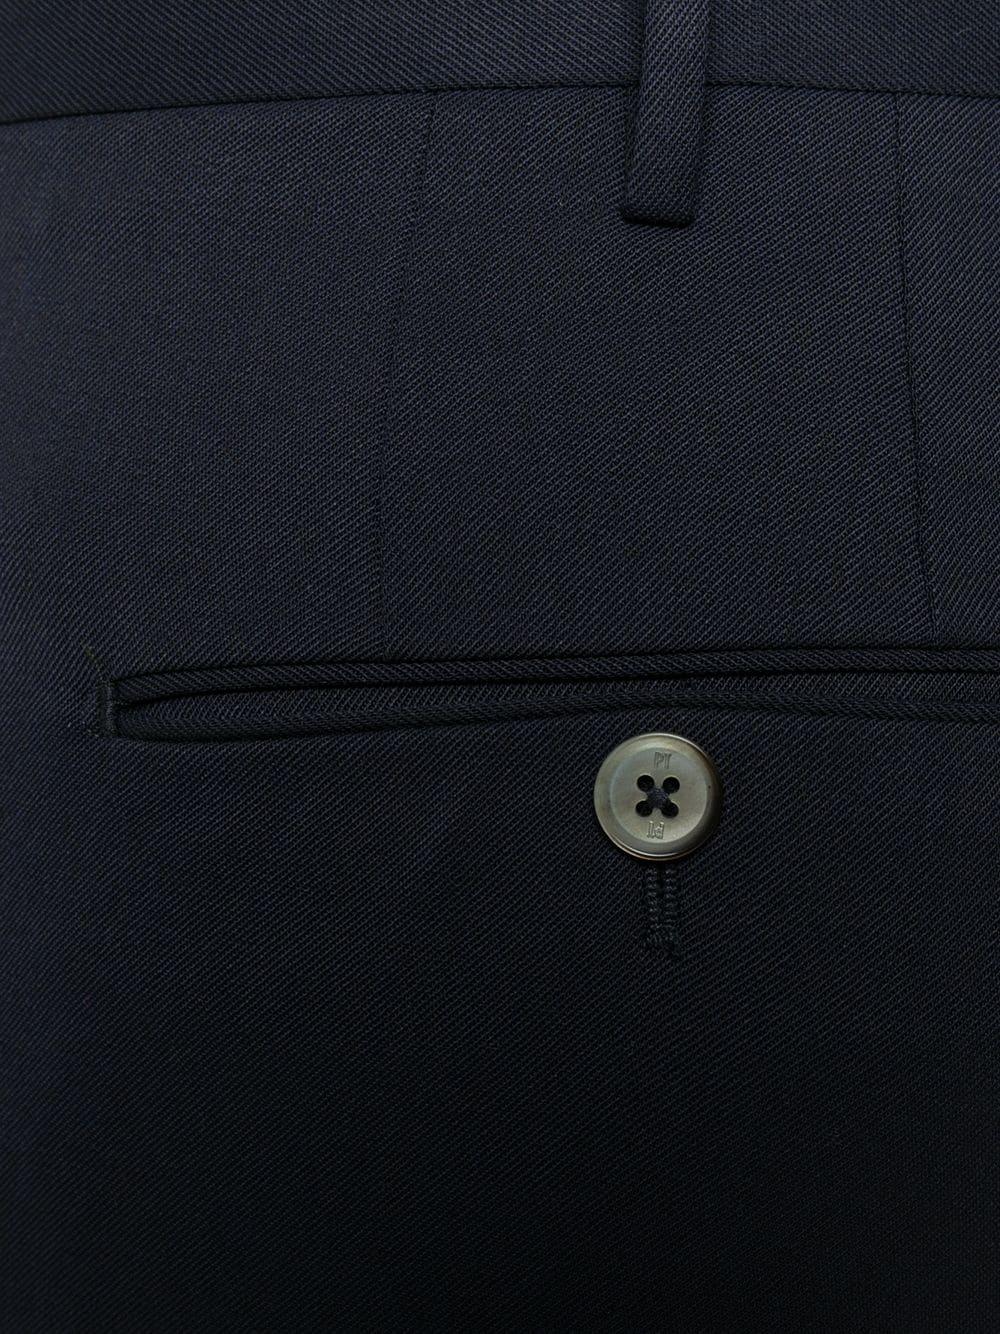 Chino slim fit in lana blu PT01 | Pantaloni | COKSTVZ00TVL-PO360360